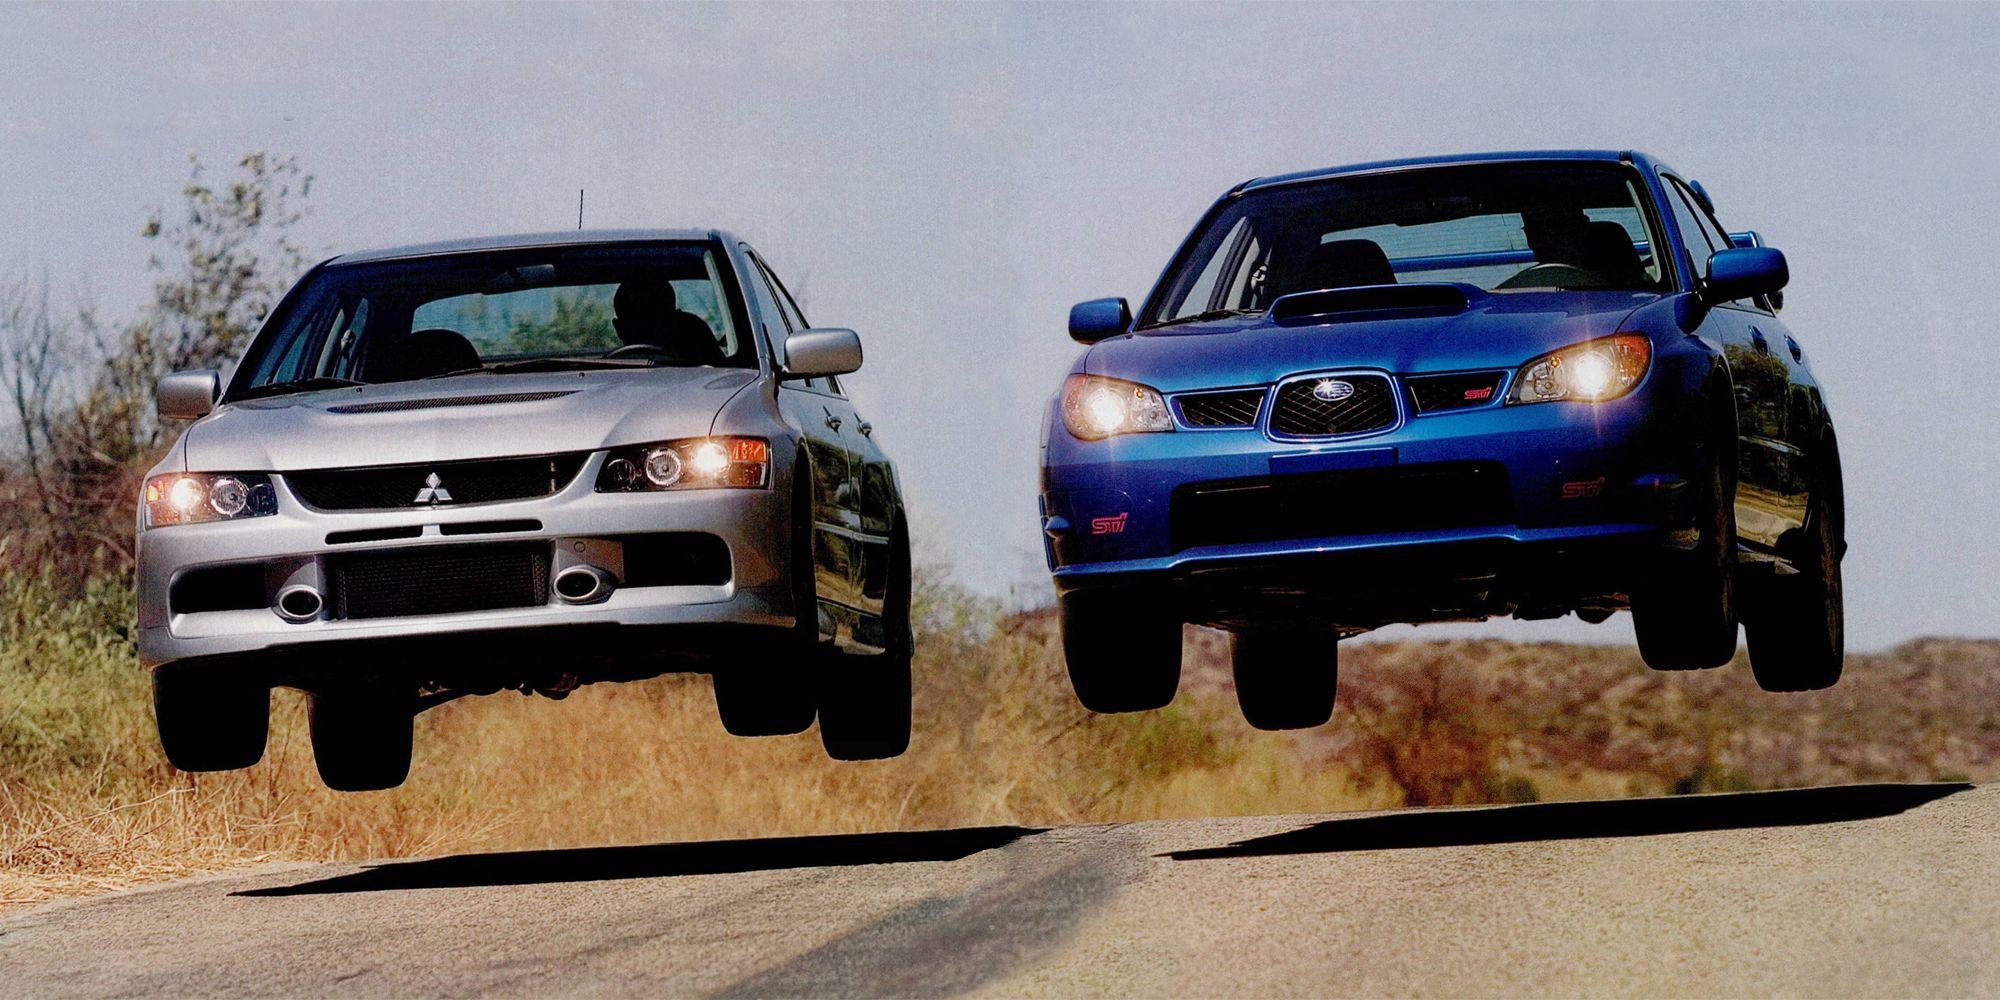 Mitsubishi Evo IX MR vs Subaru Impreza WRX STI: Which Is Better?